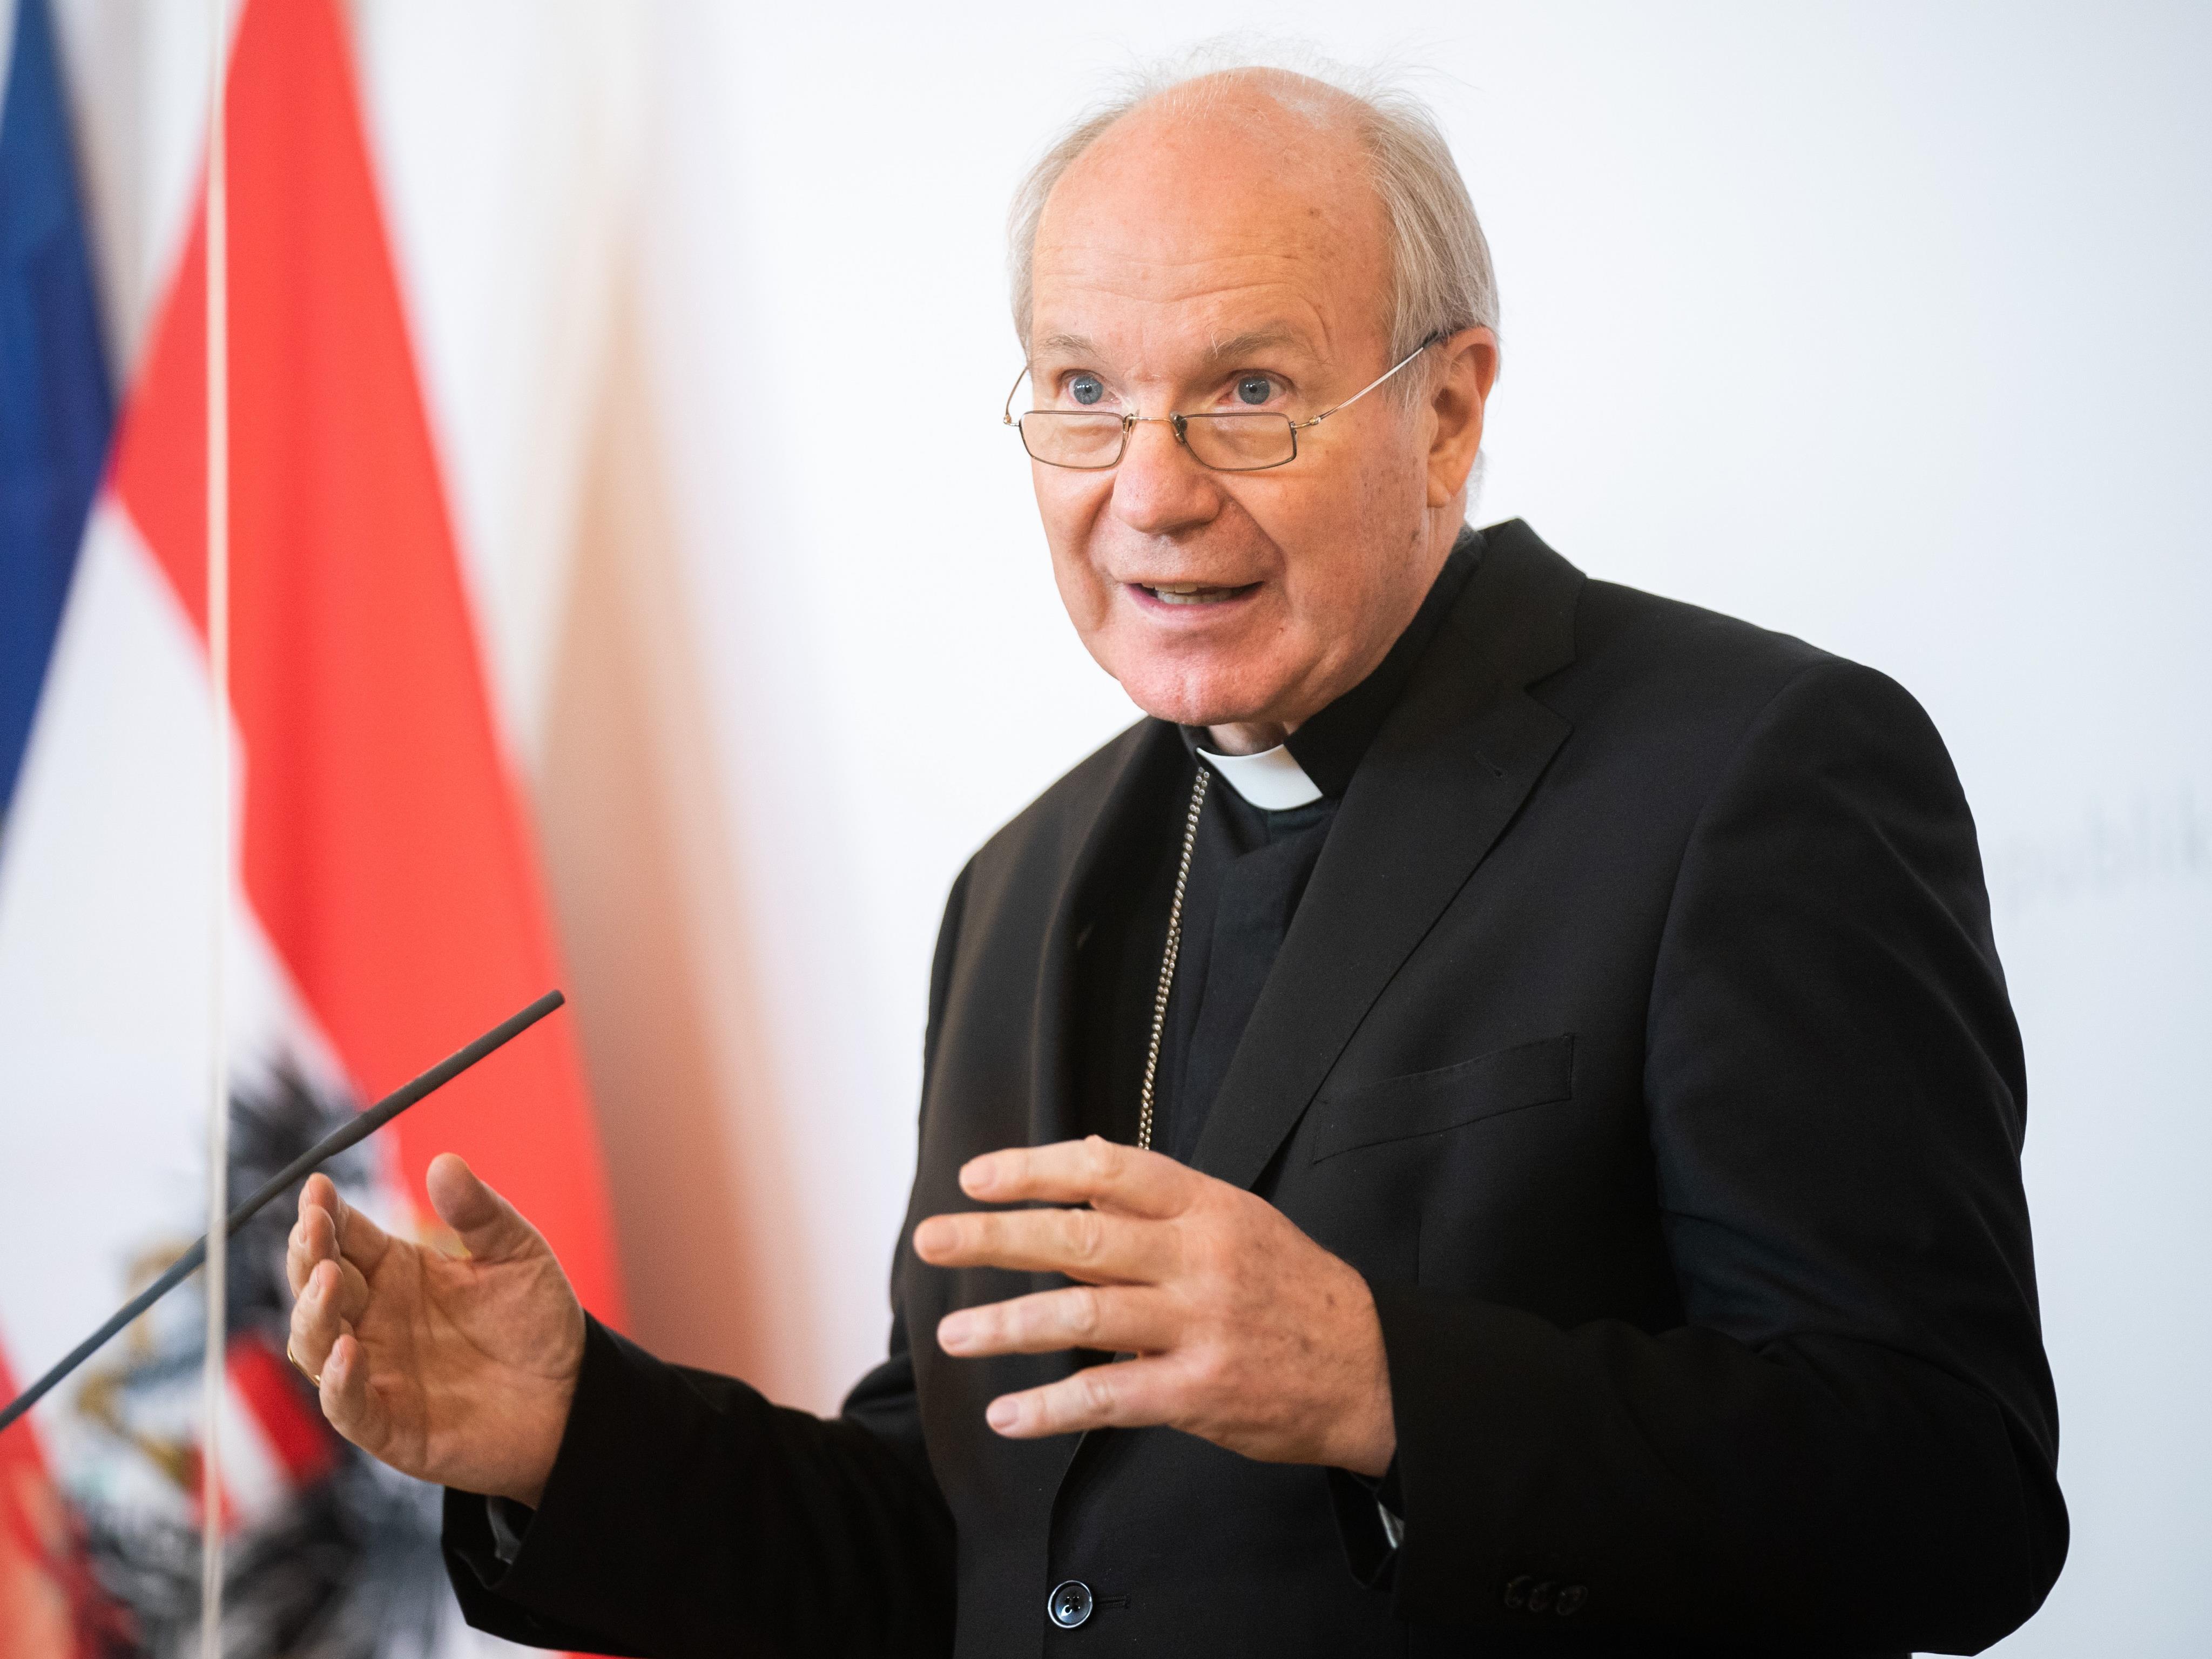 Schönborn hat altersbedingt seinen Rücktritt angekündigt.